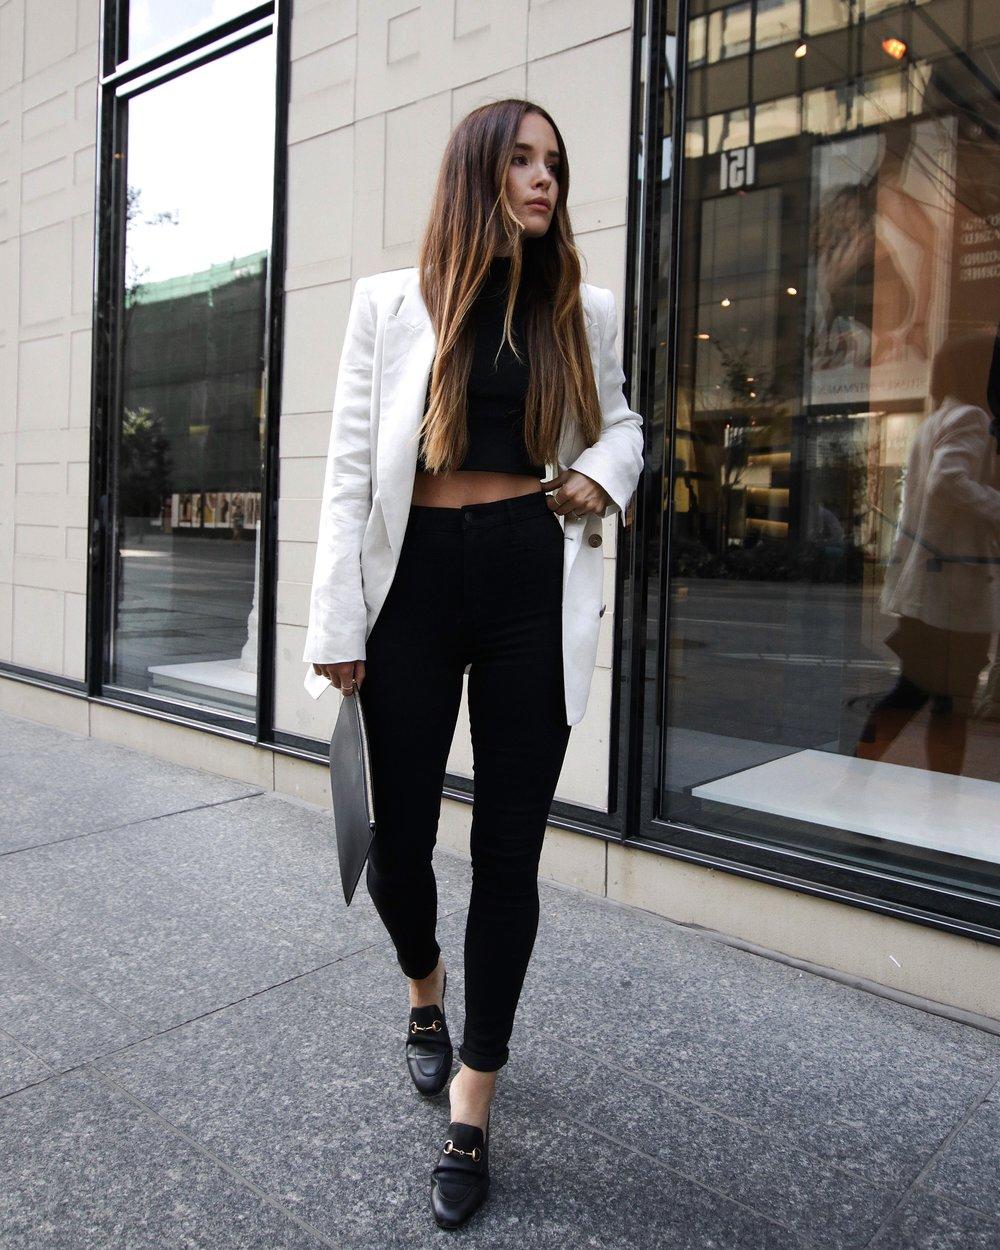 Jodi_Blk_Highrise_Black_Jeans